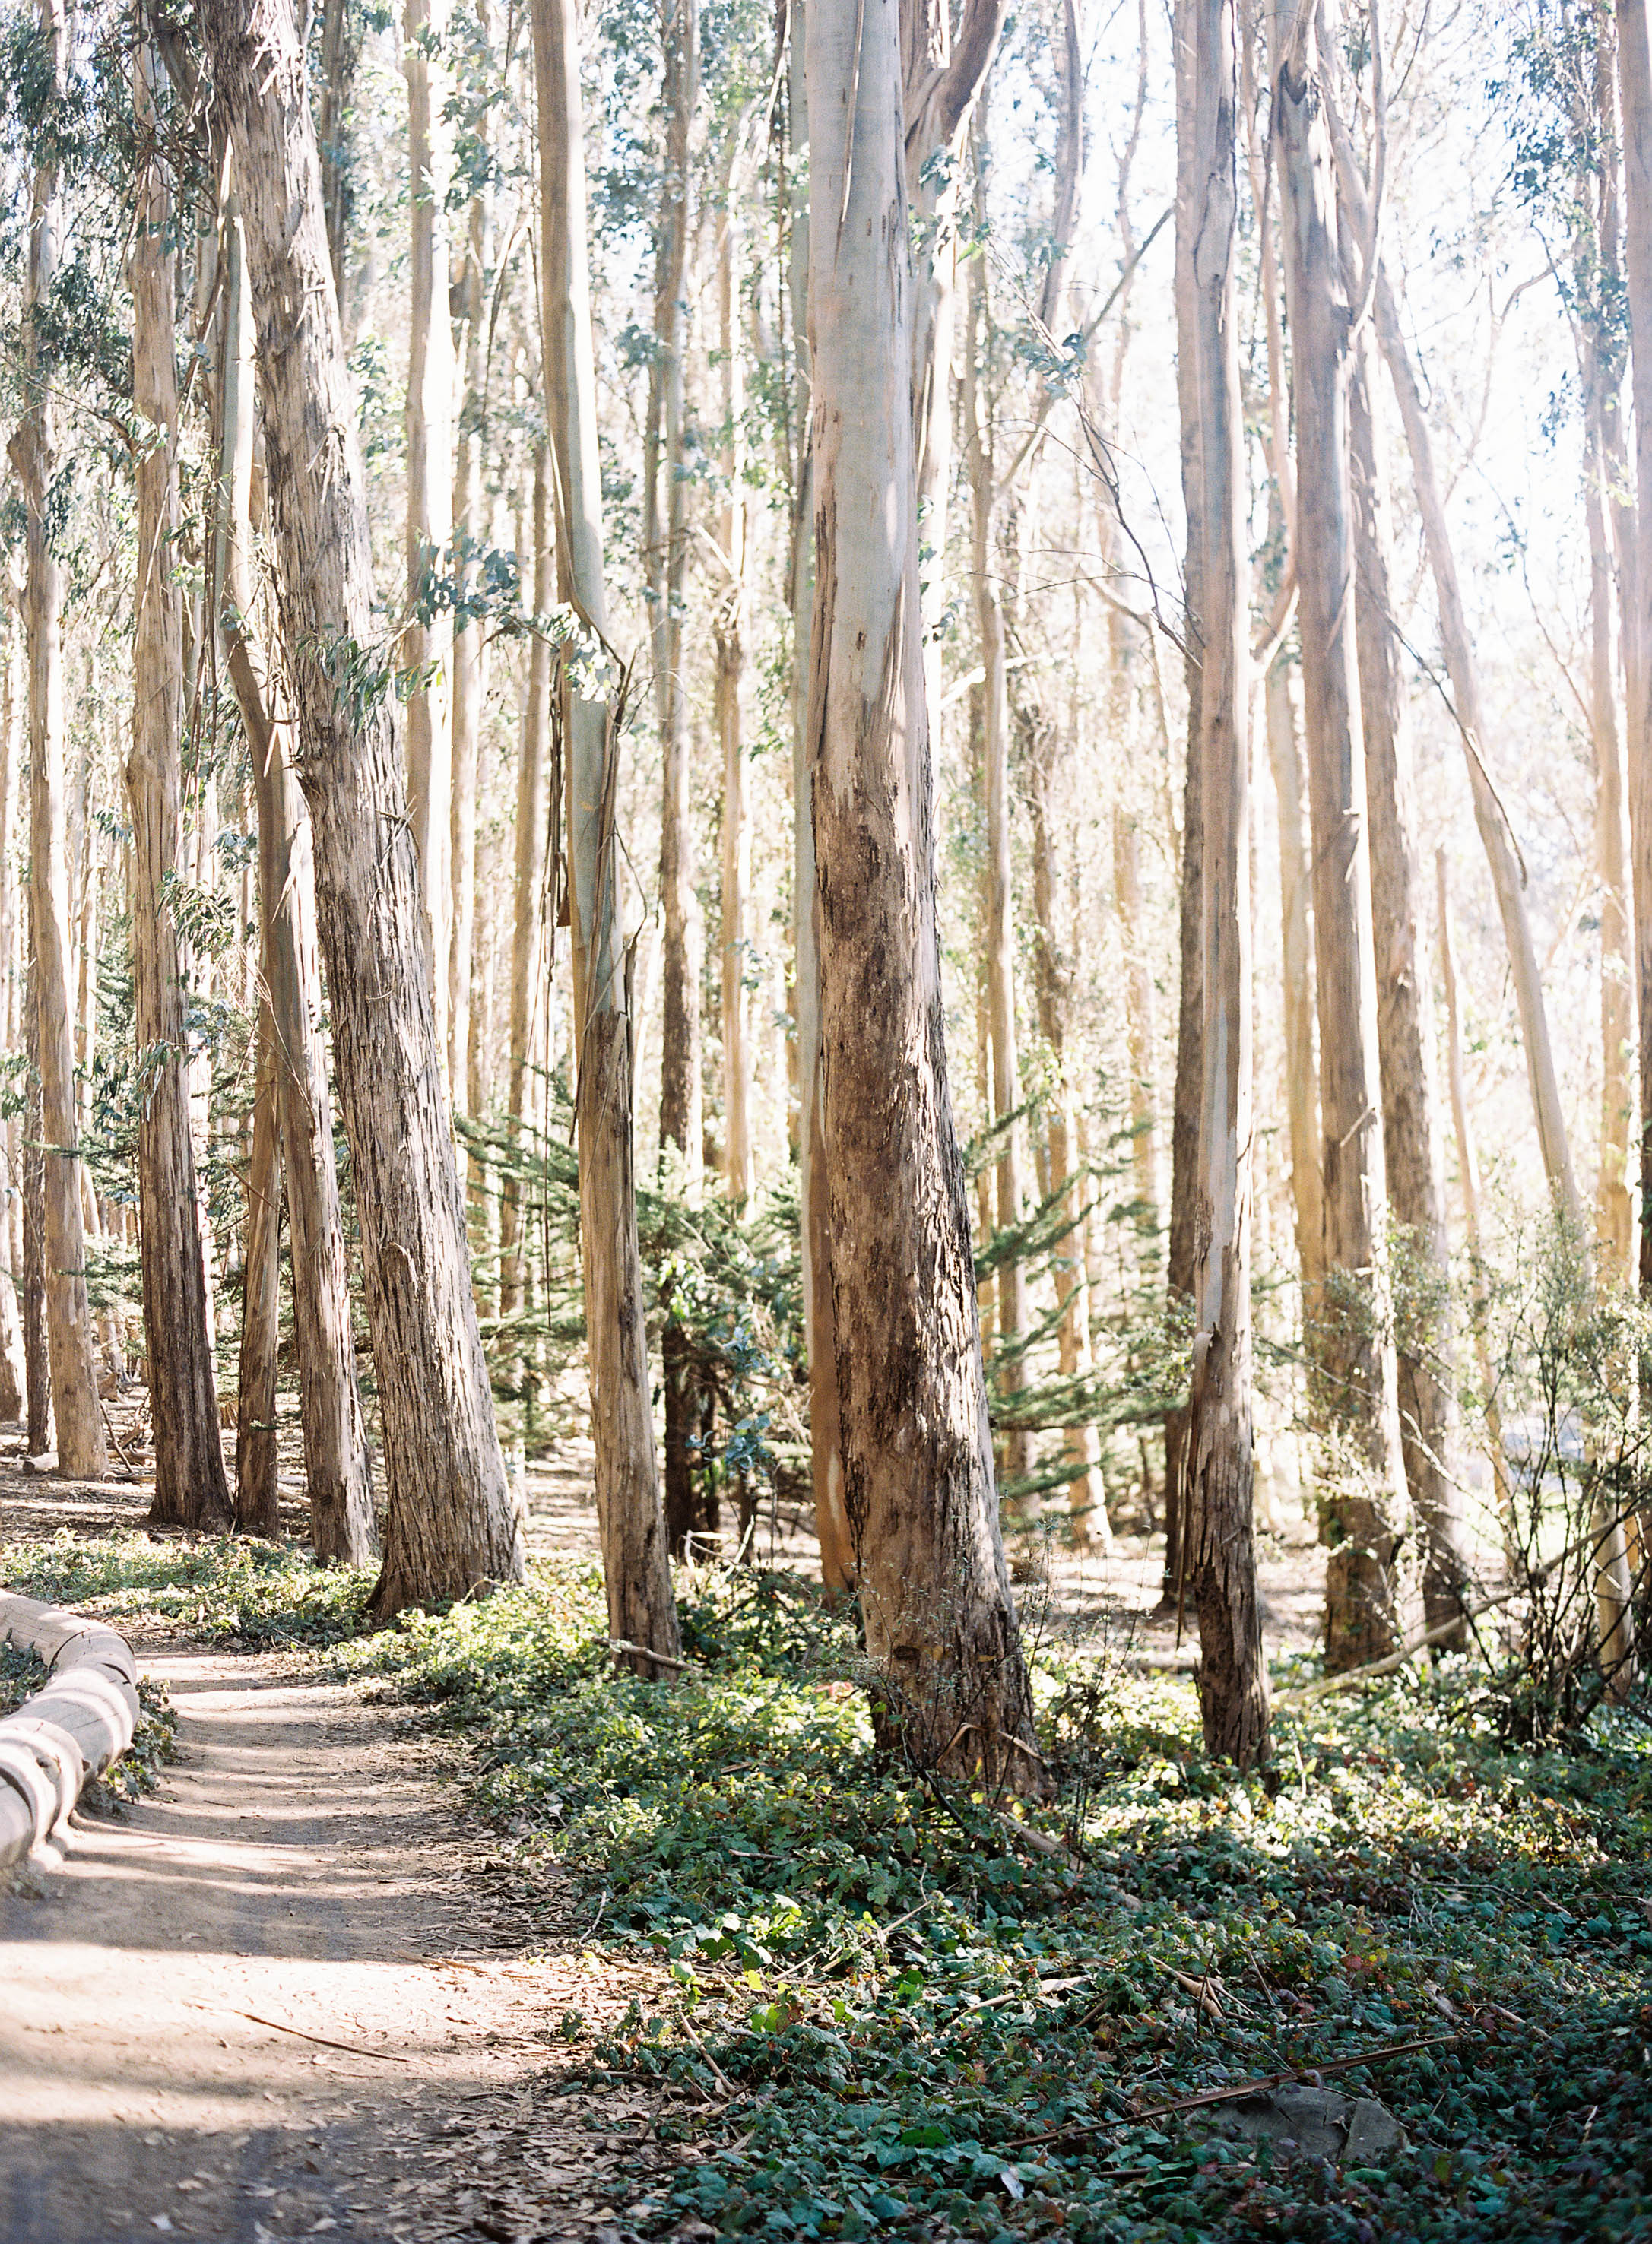 Meghan Mehan Photography - Fine Art Film Photography - California | San Francisco | Napa | Sonoma | Carmel | Big Sur | Santa Barbara | Nashville 048.jpg